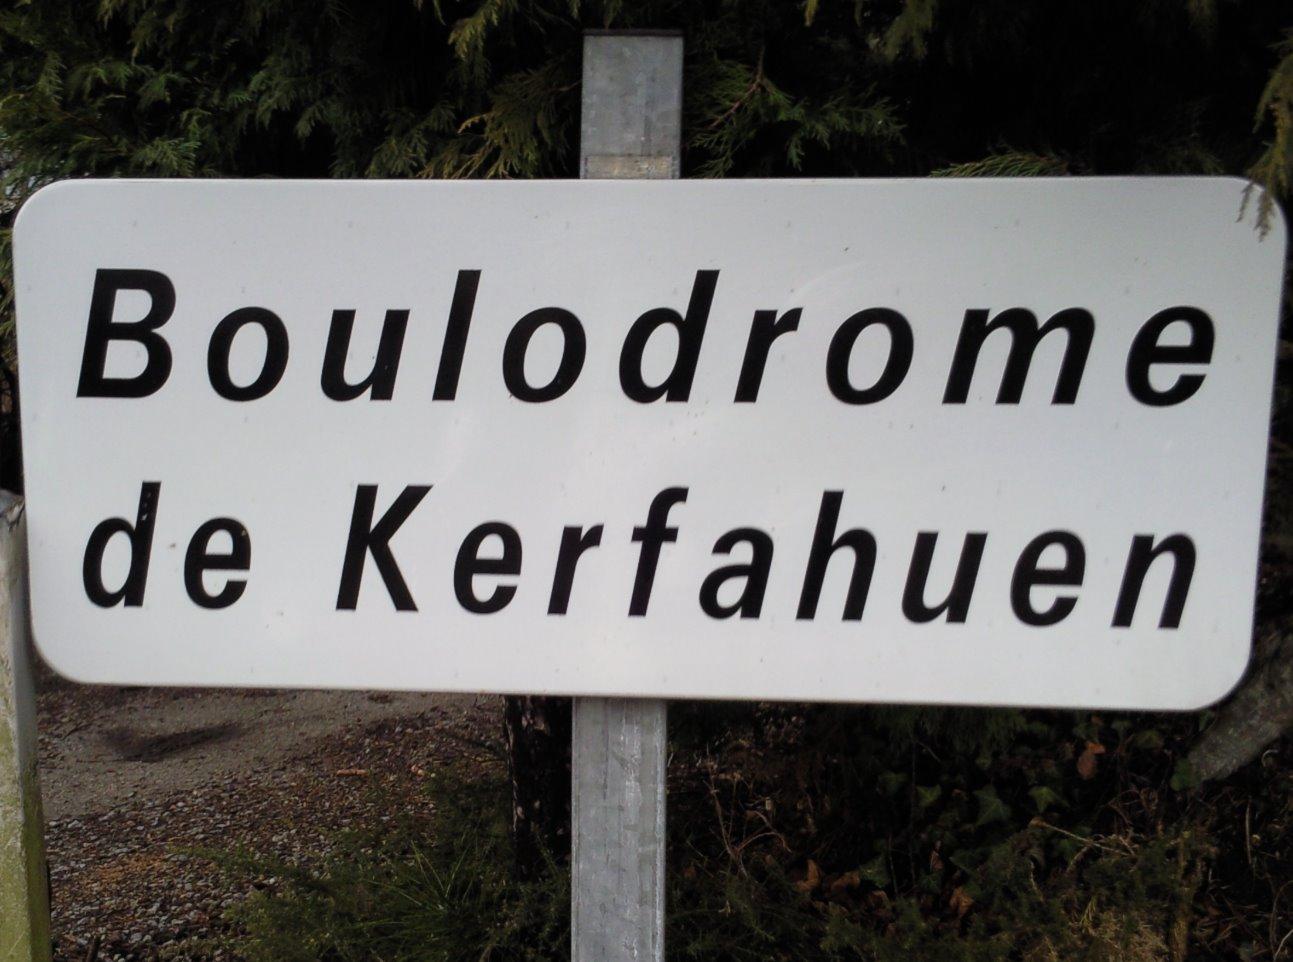 LeboulodromedeKerfahuen_edited